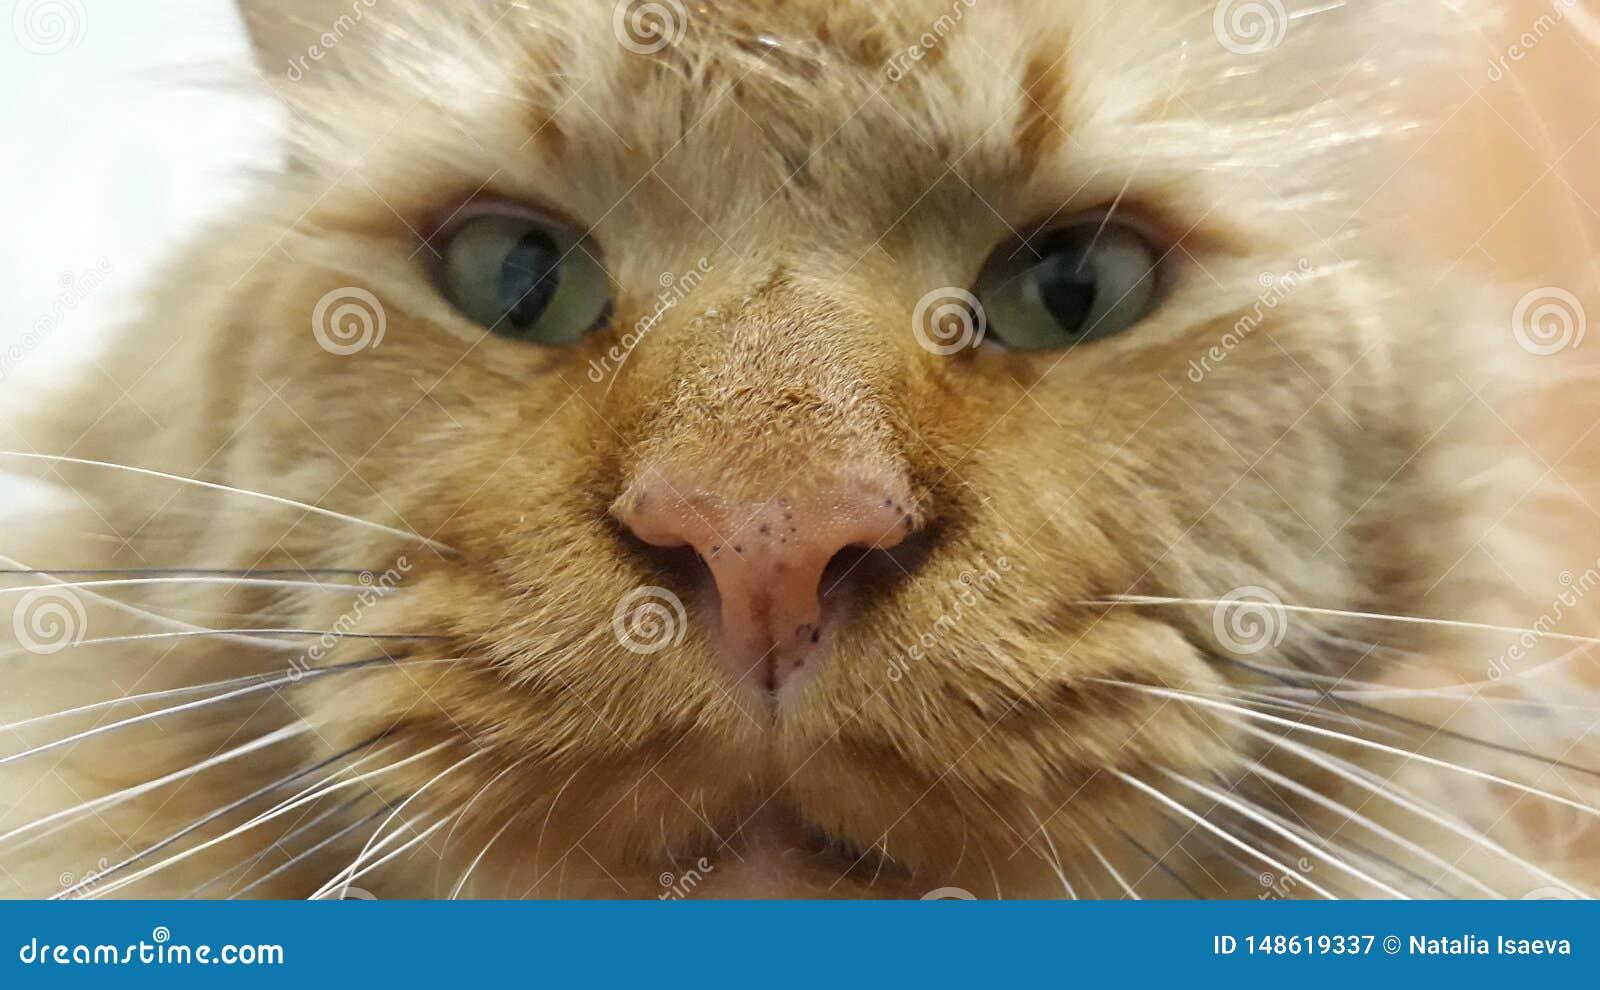 Cat muzzle close up